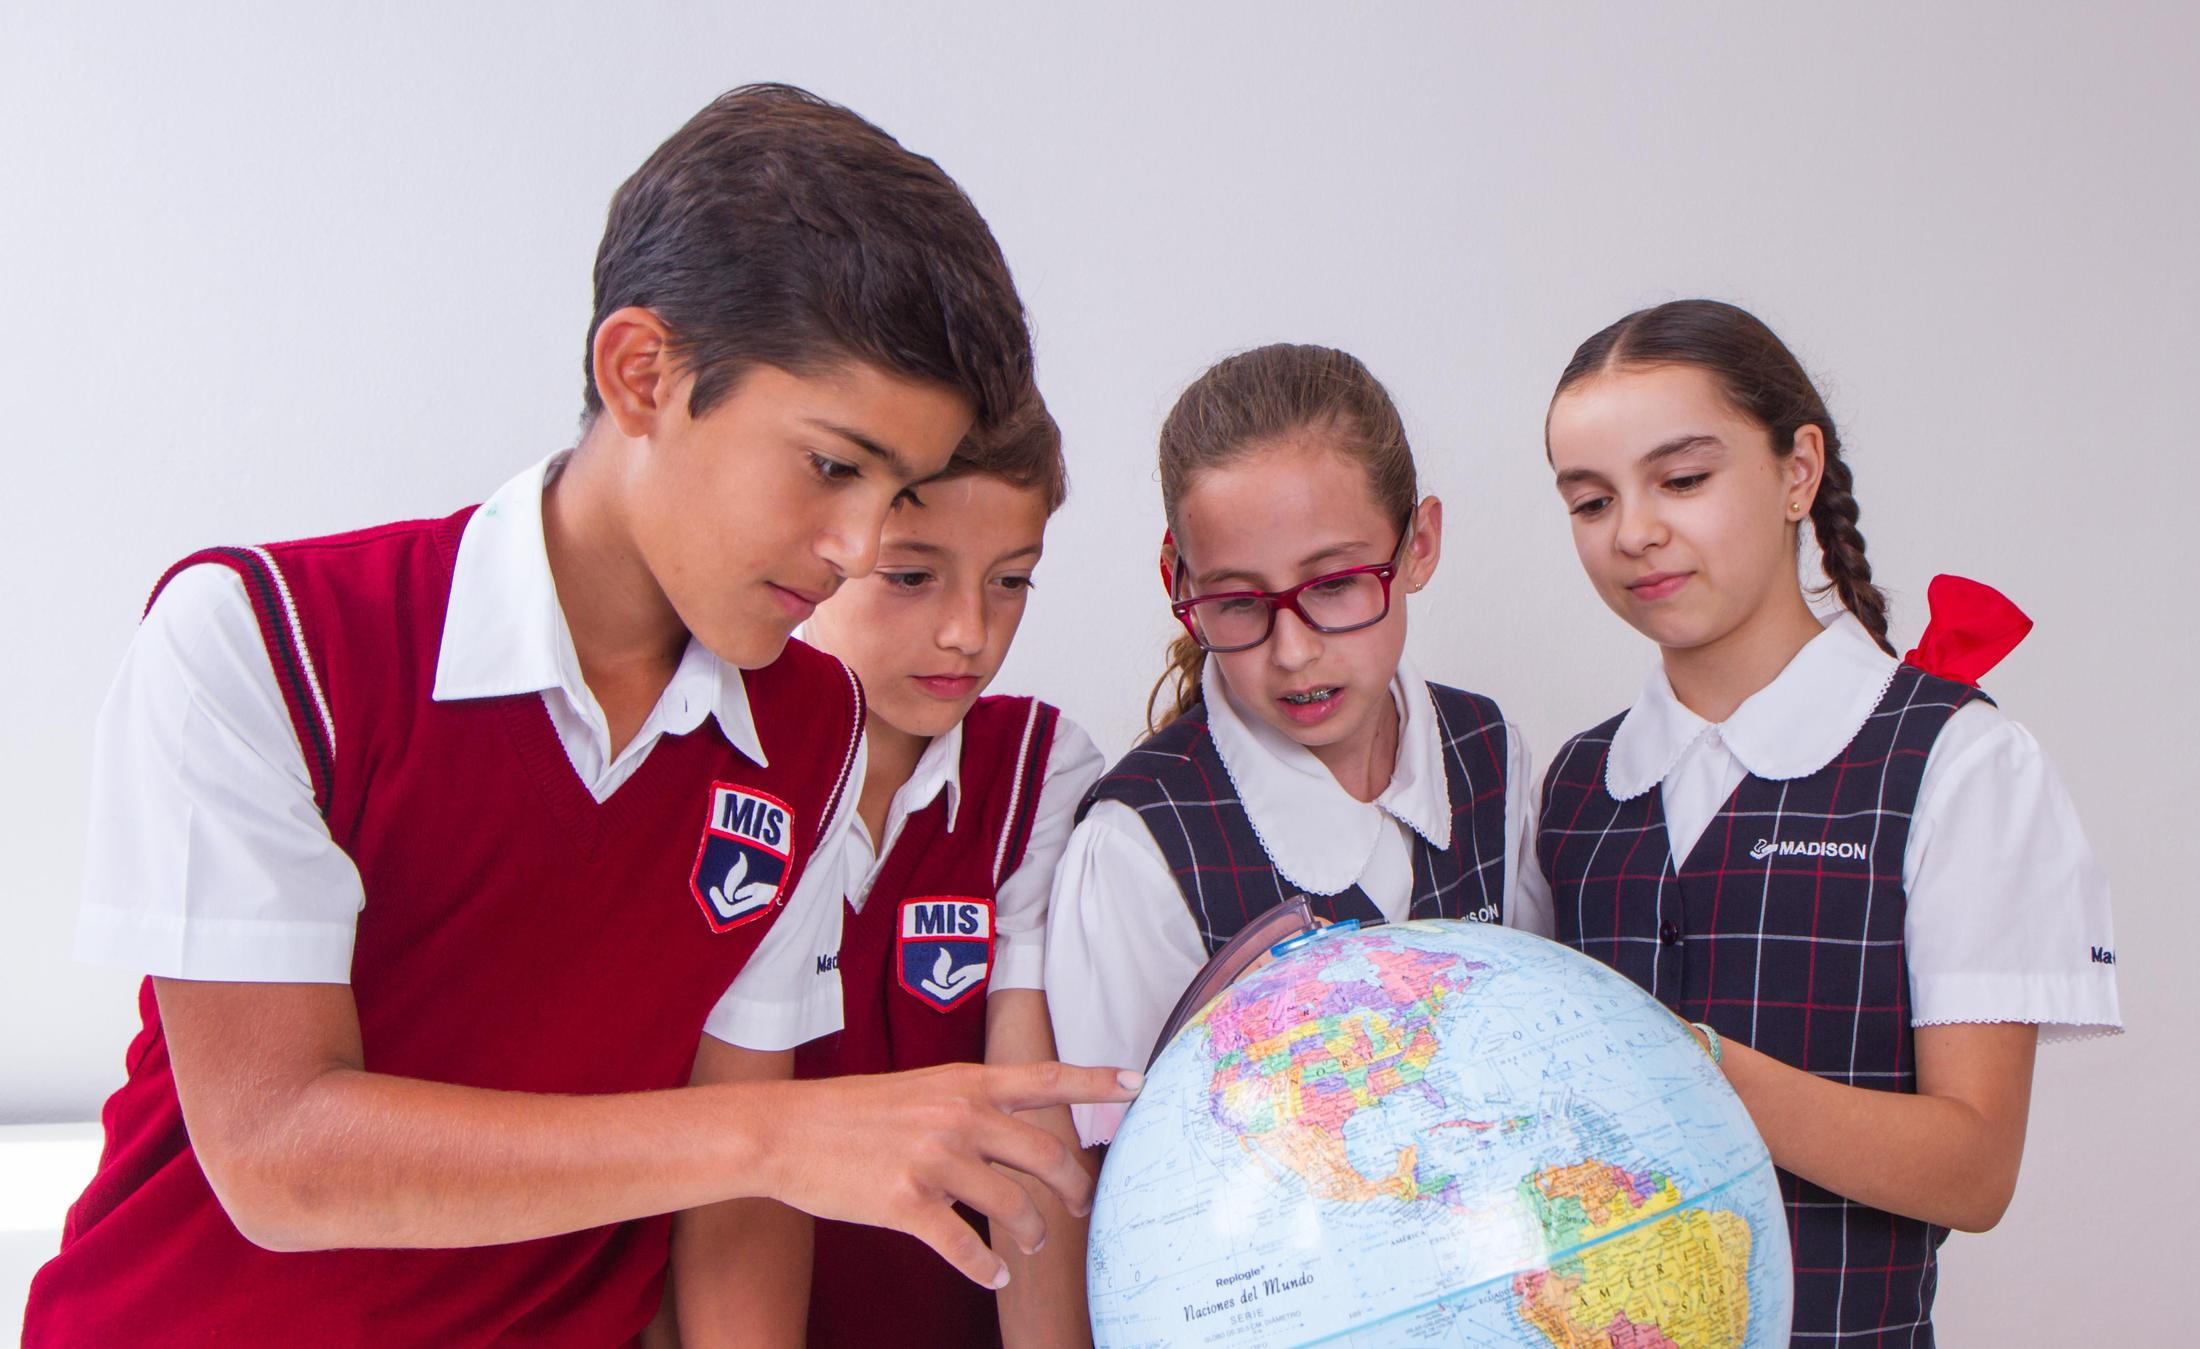 madison-international-school-merida-5